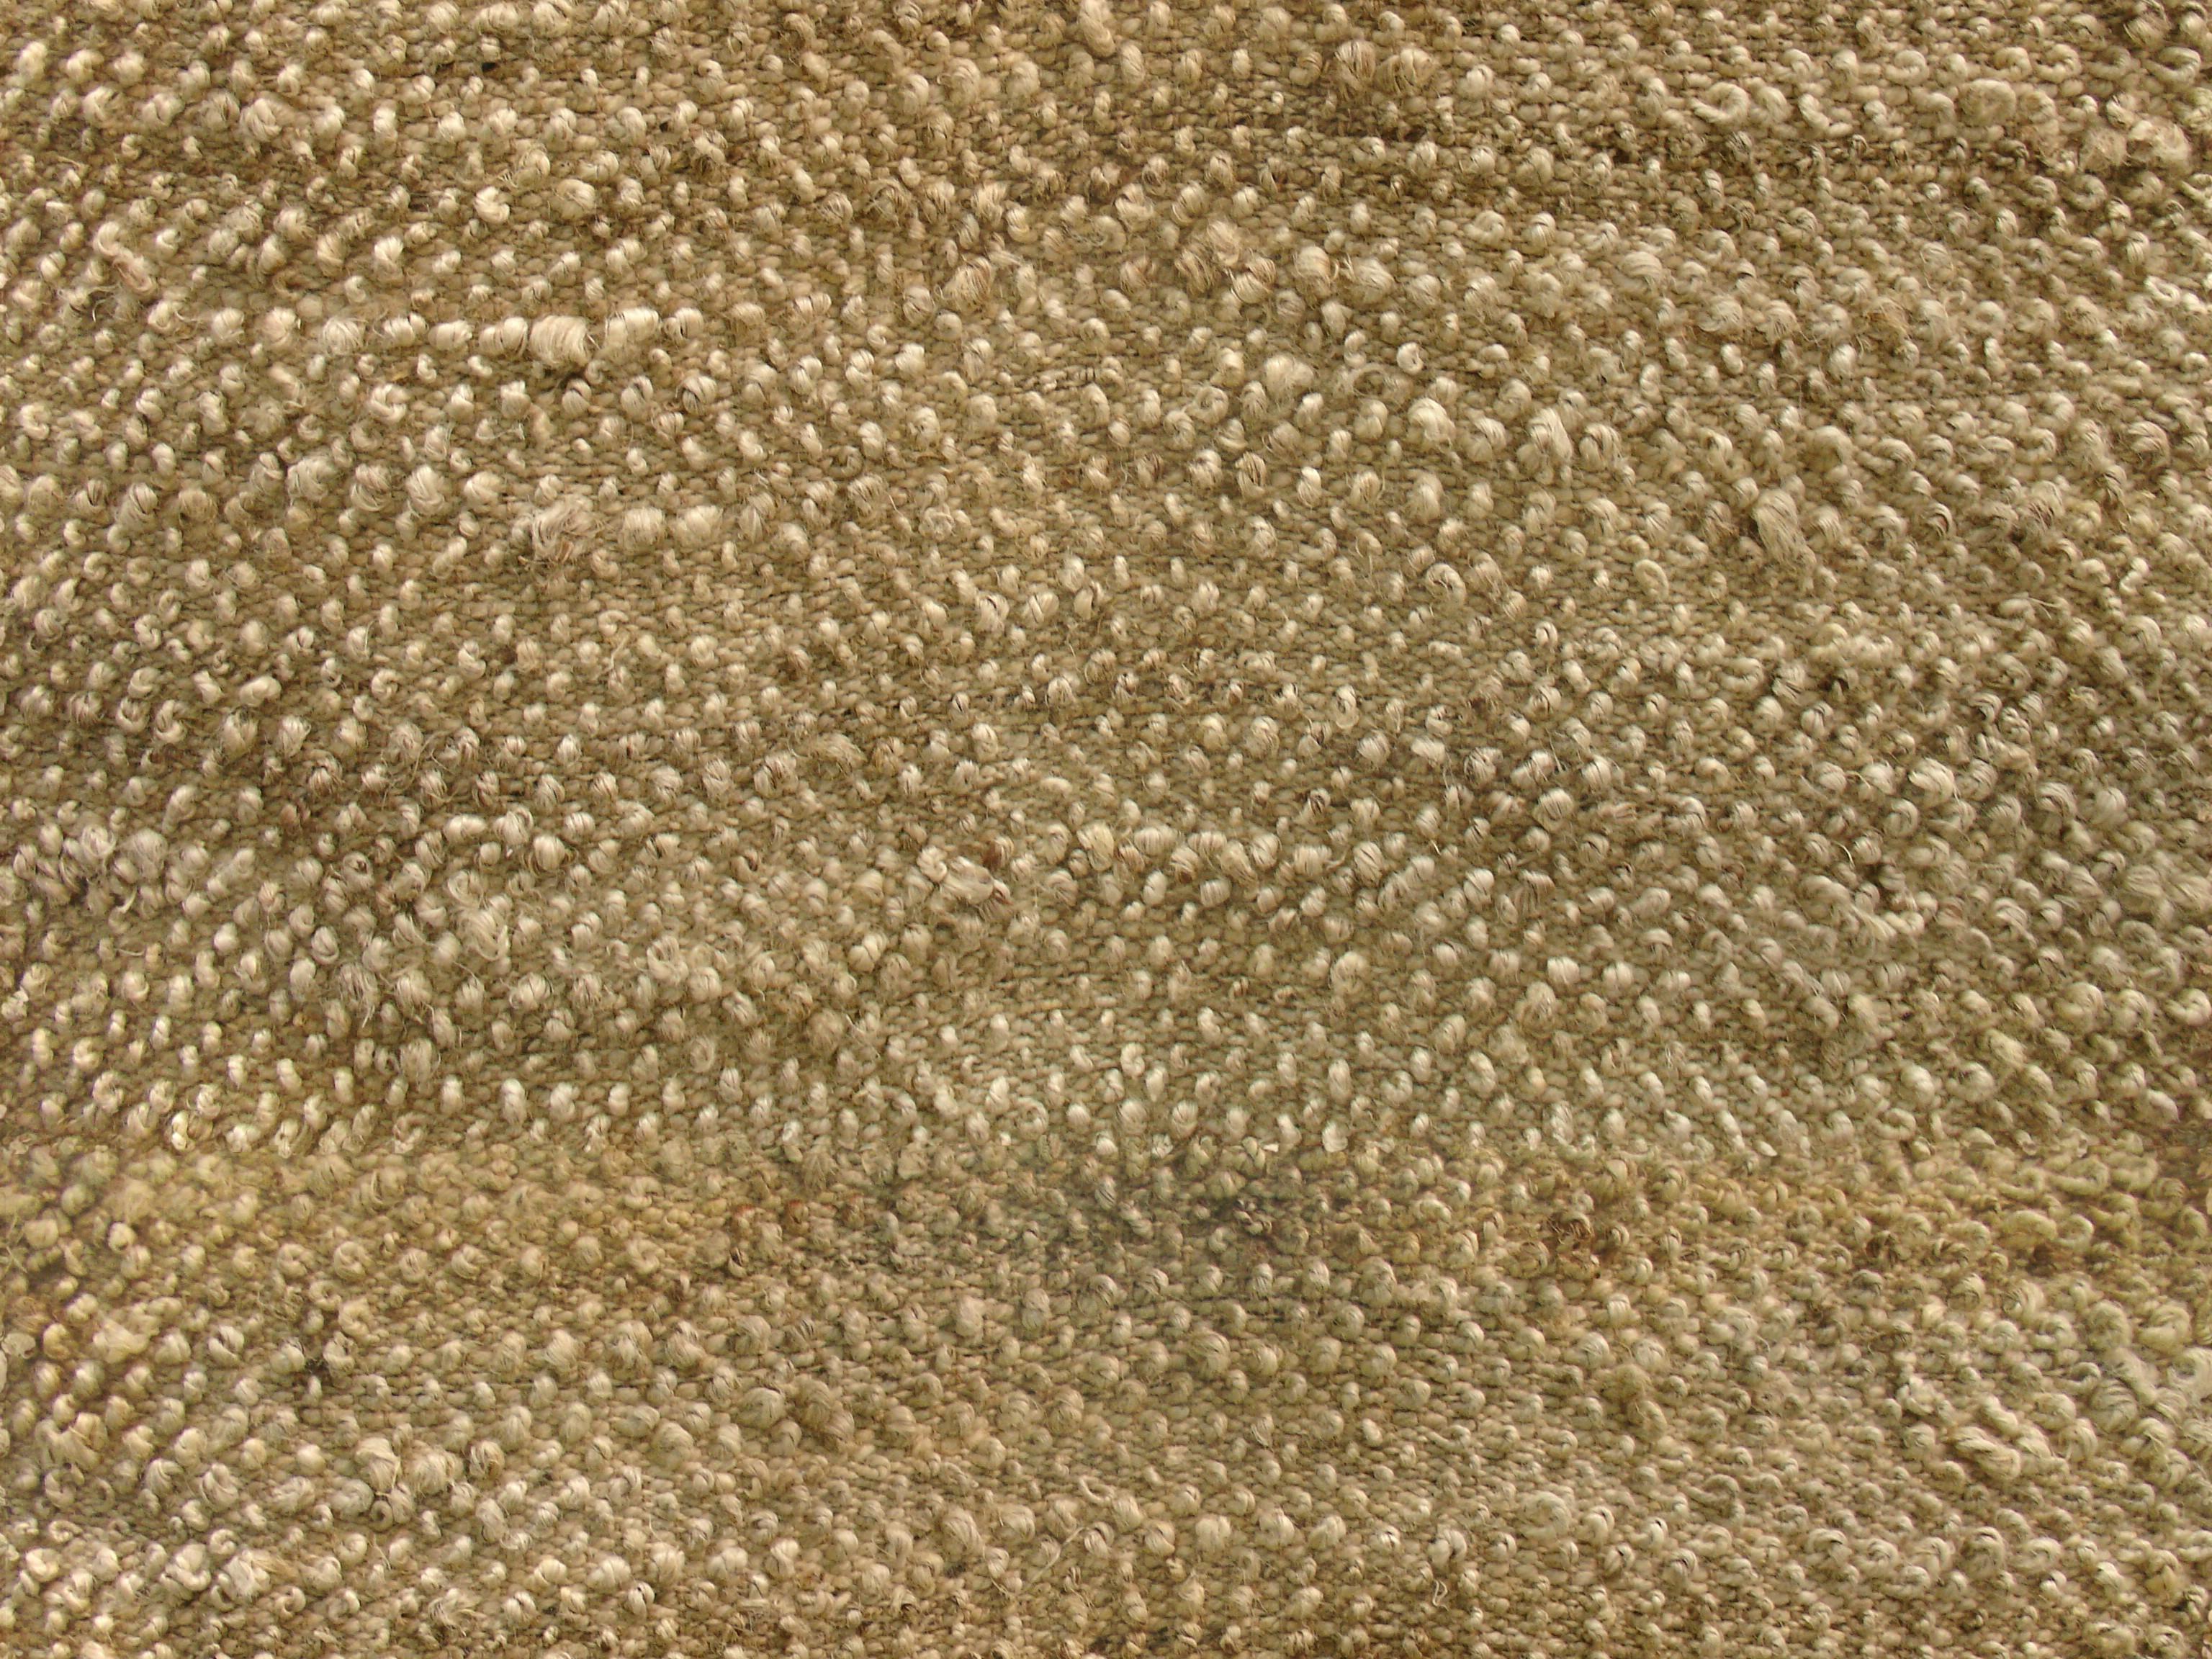 Какую ткань кладут лорд клубника фото доставка эстонии